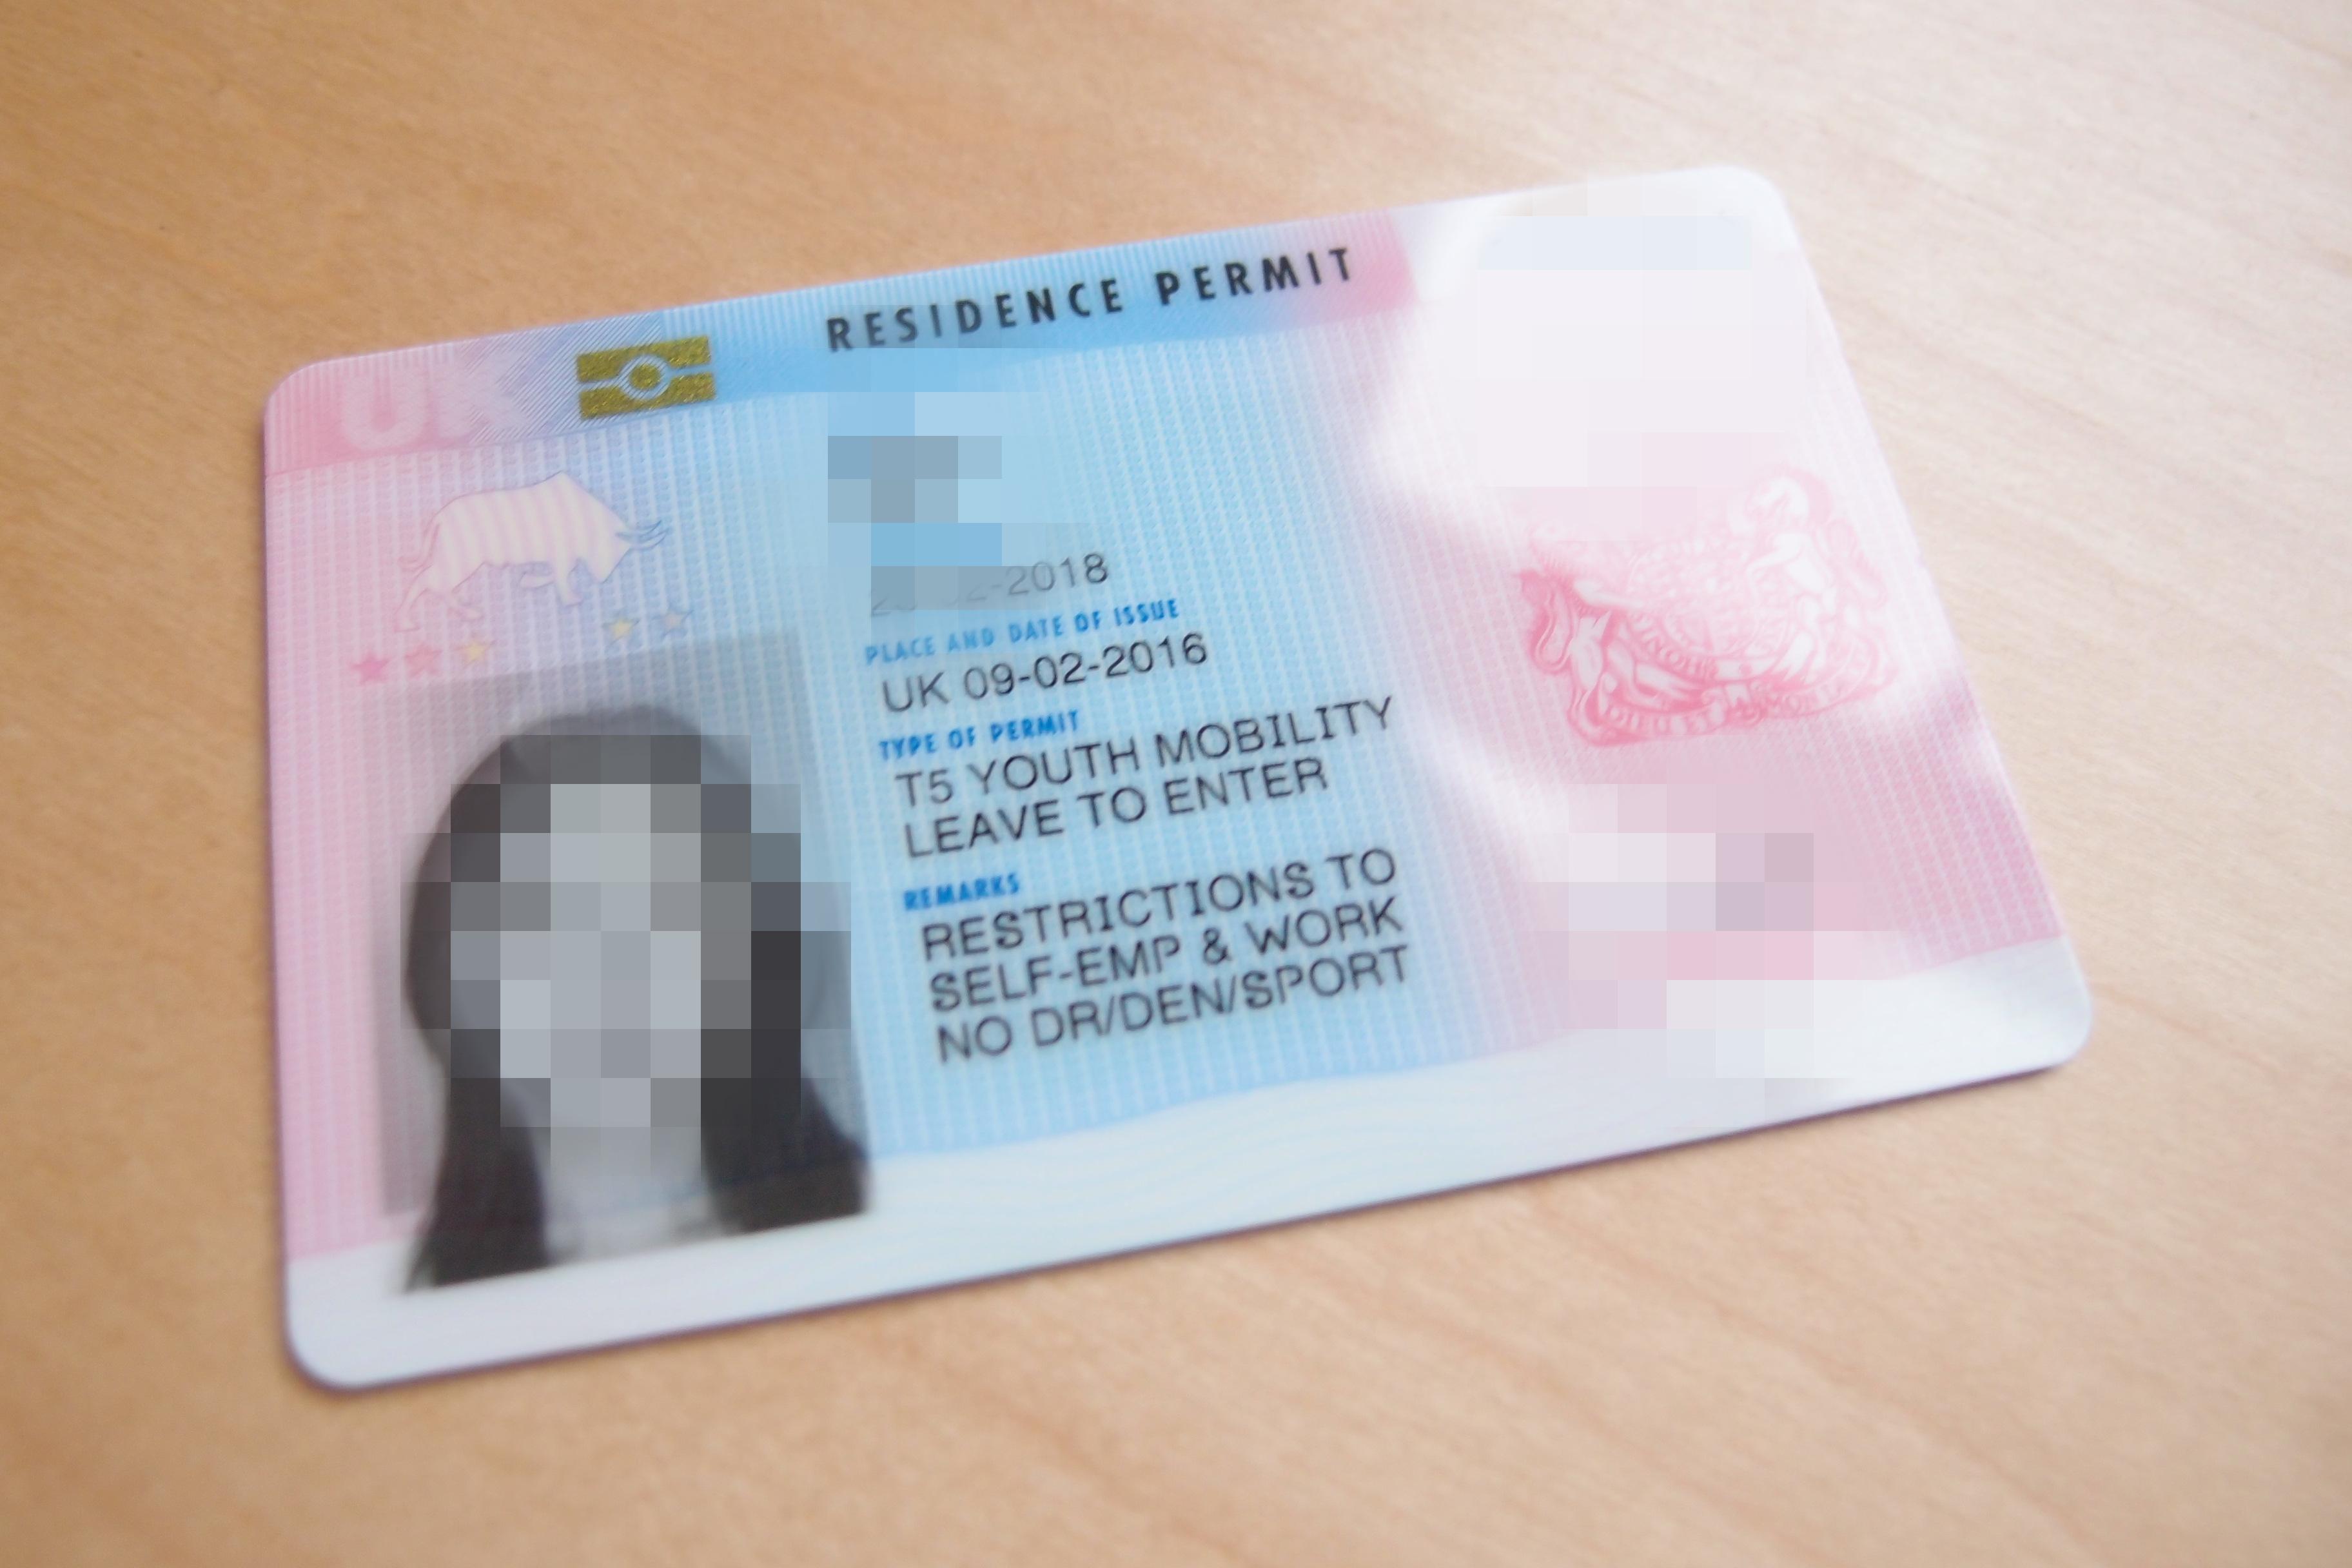 BRP( biometric residence permit)を受け取りに行きました!